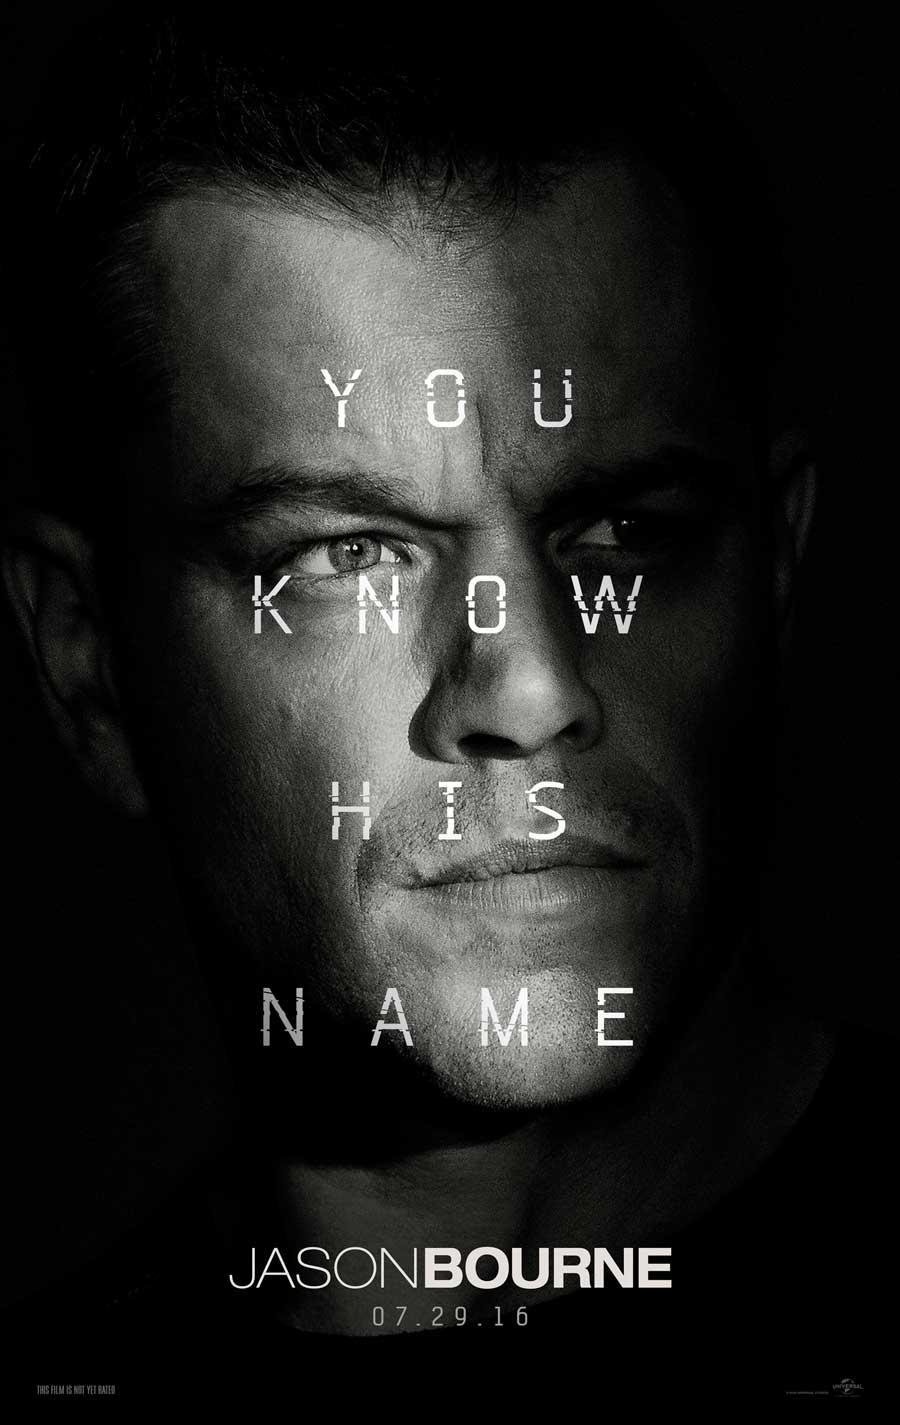 Poster for Jason Bourne